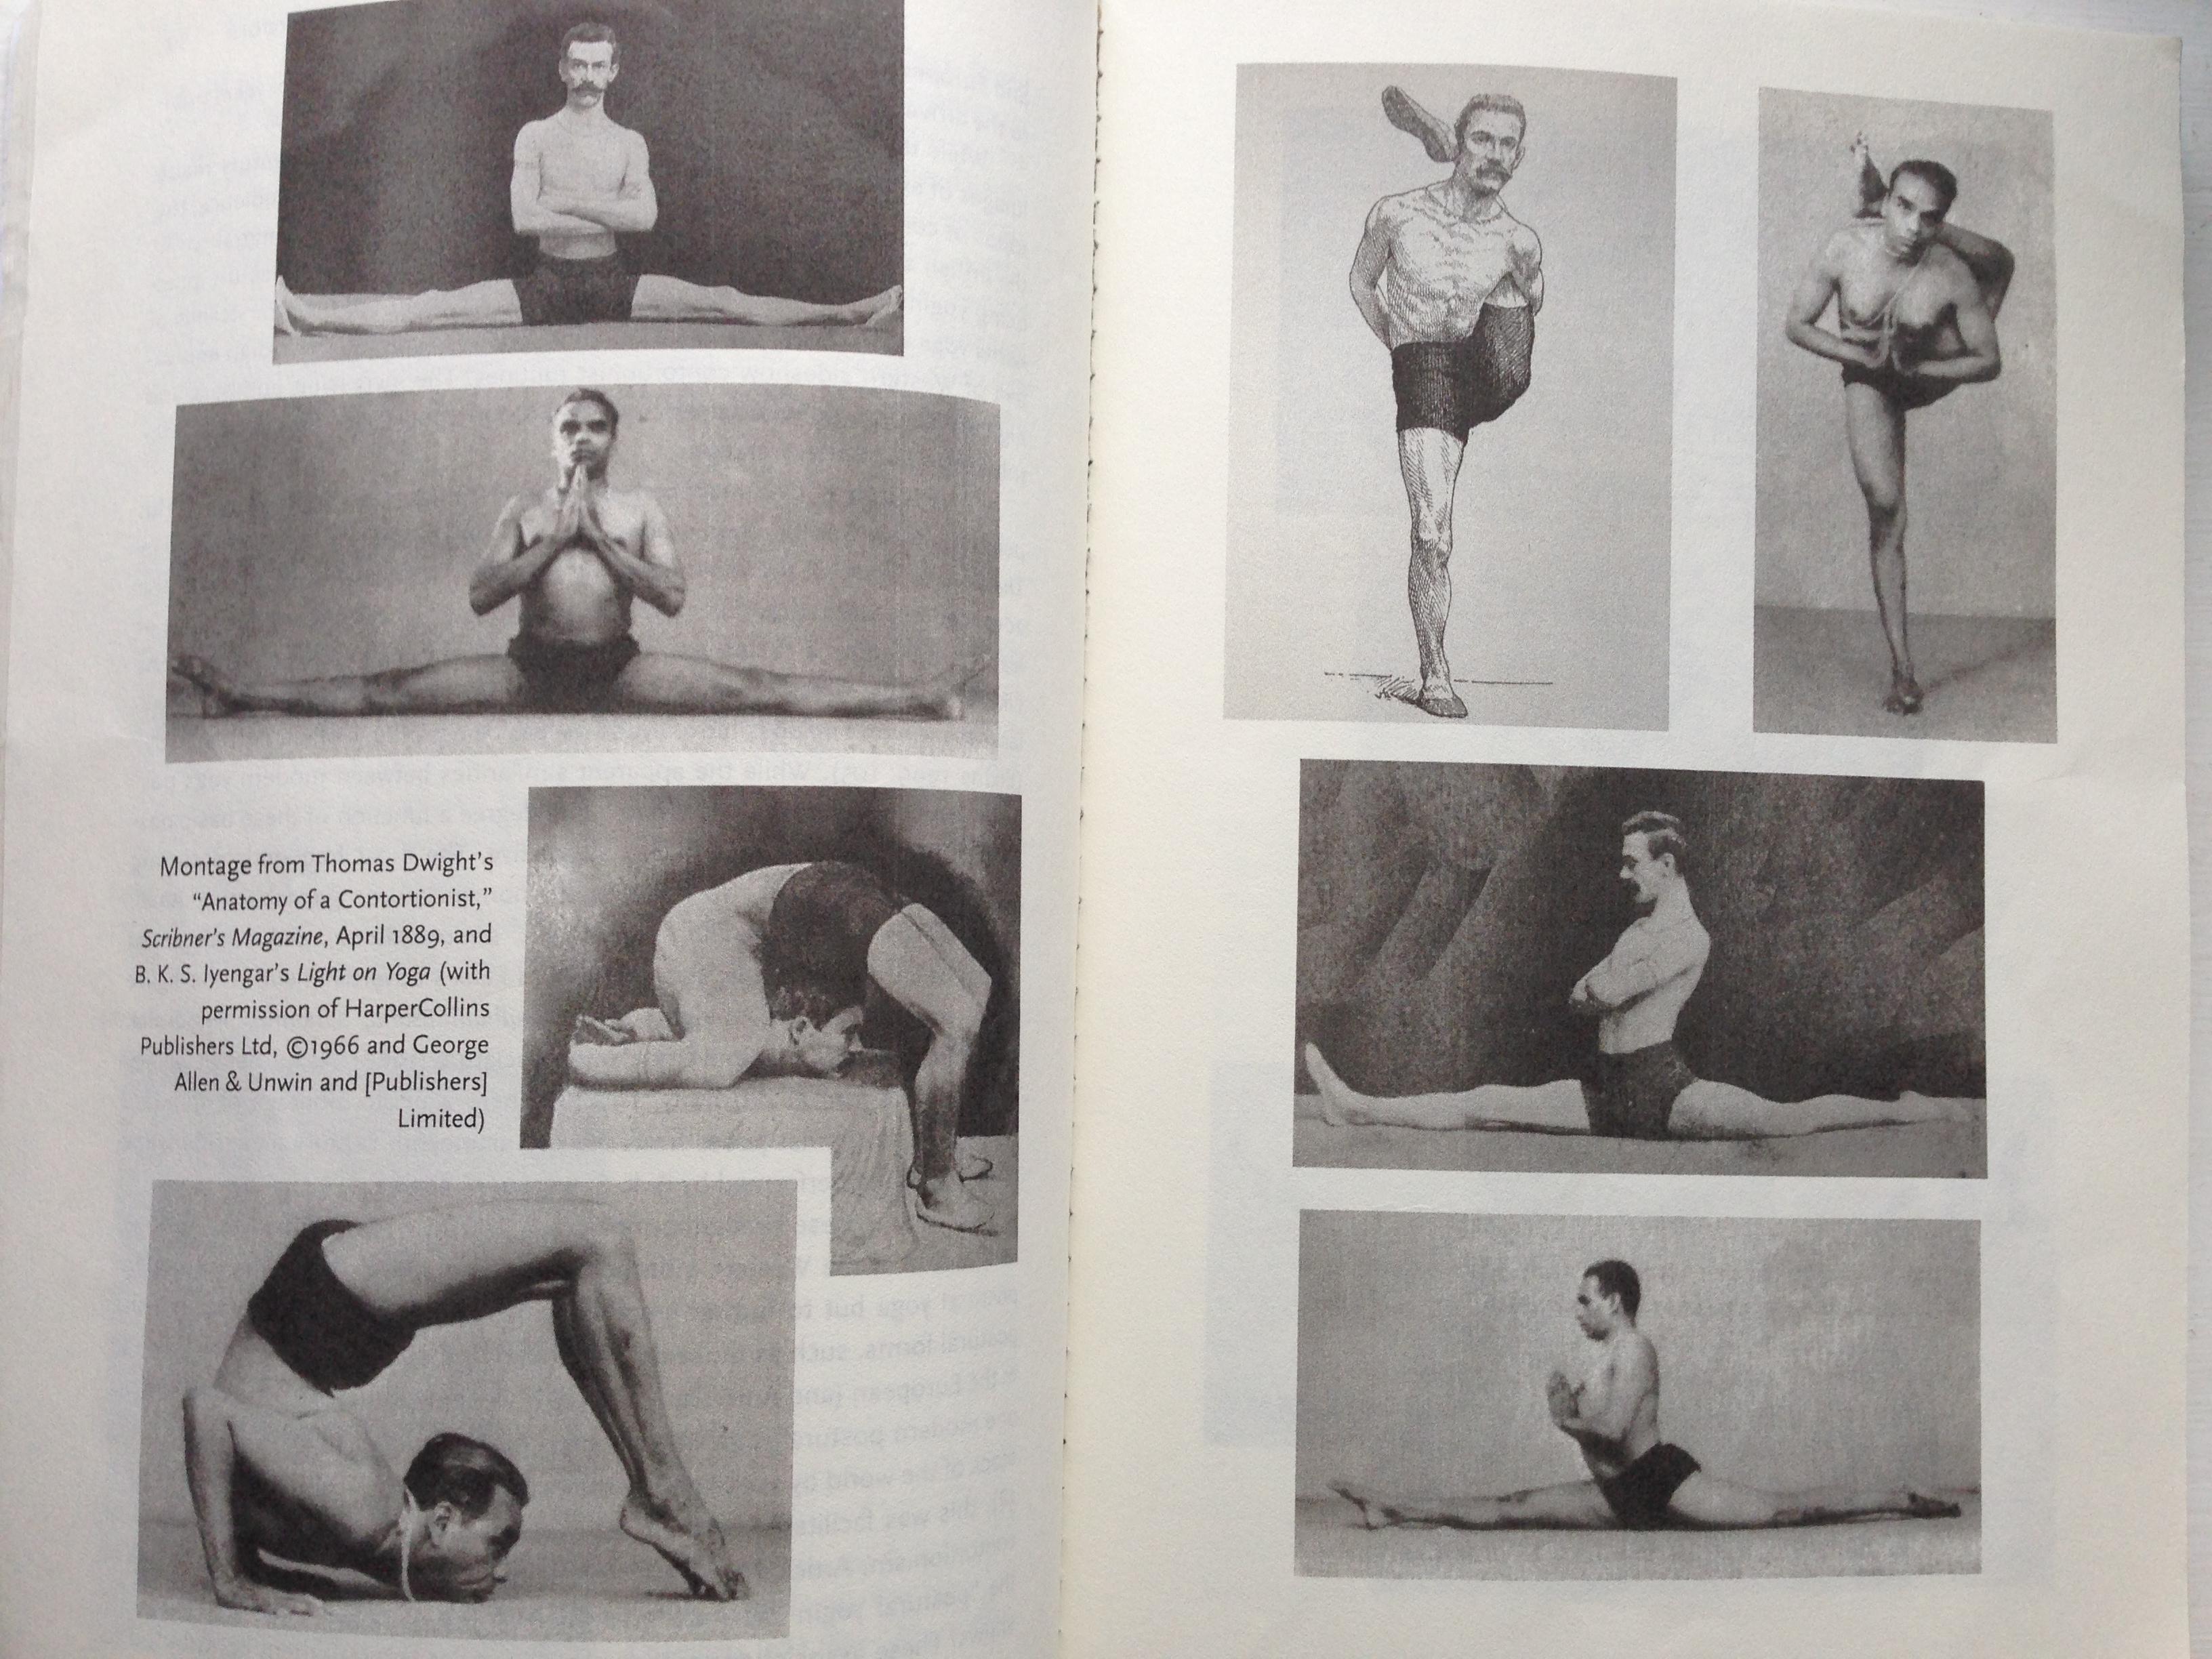 contortionist + bks